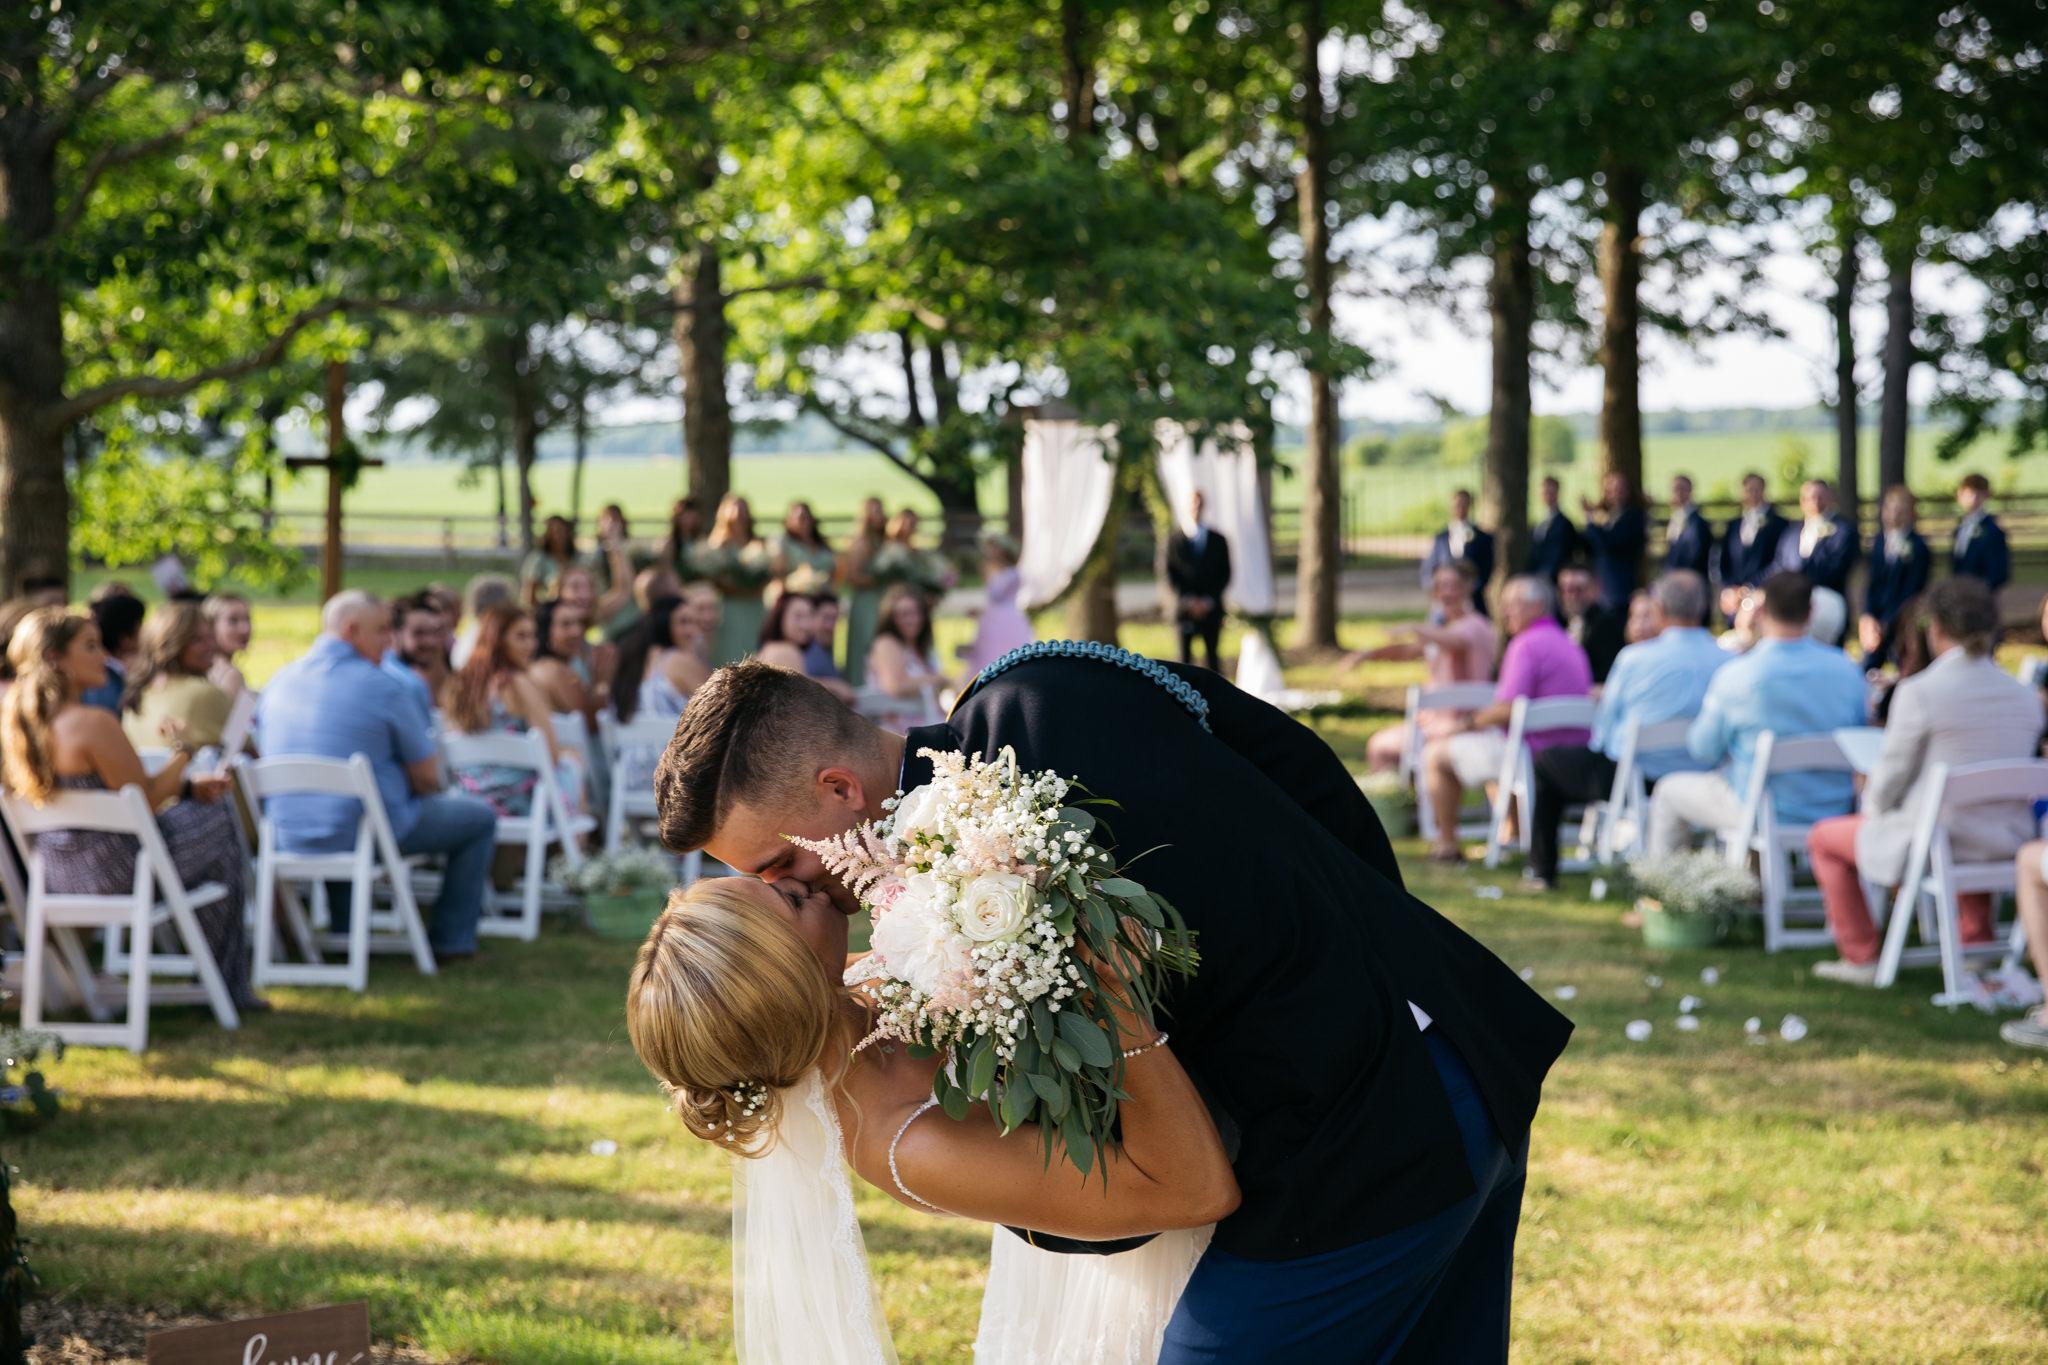 zbackyard-wedding-thewarmtharoundyou-lexy-branson-409.jpg